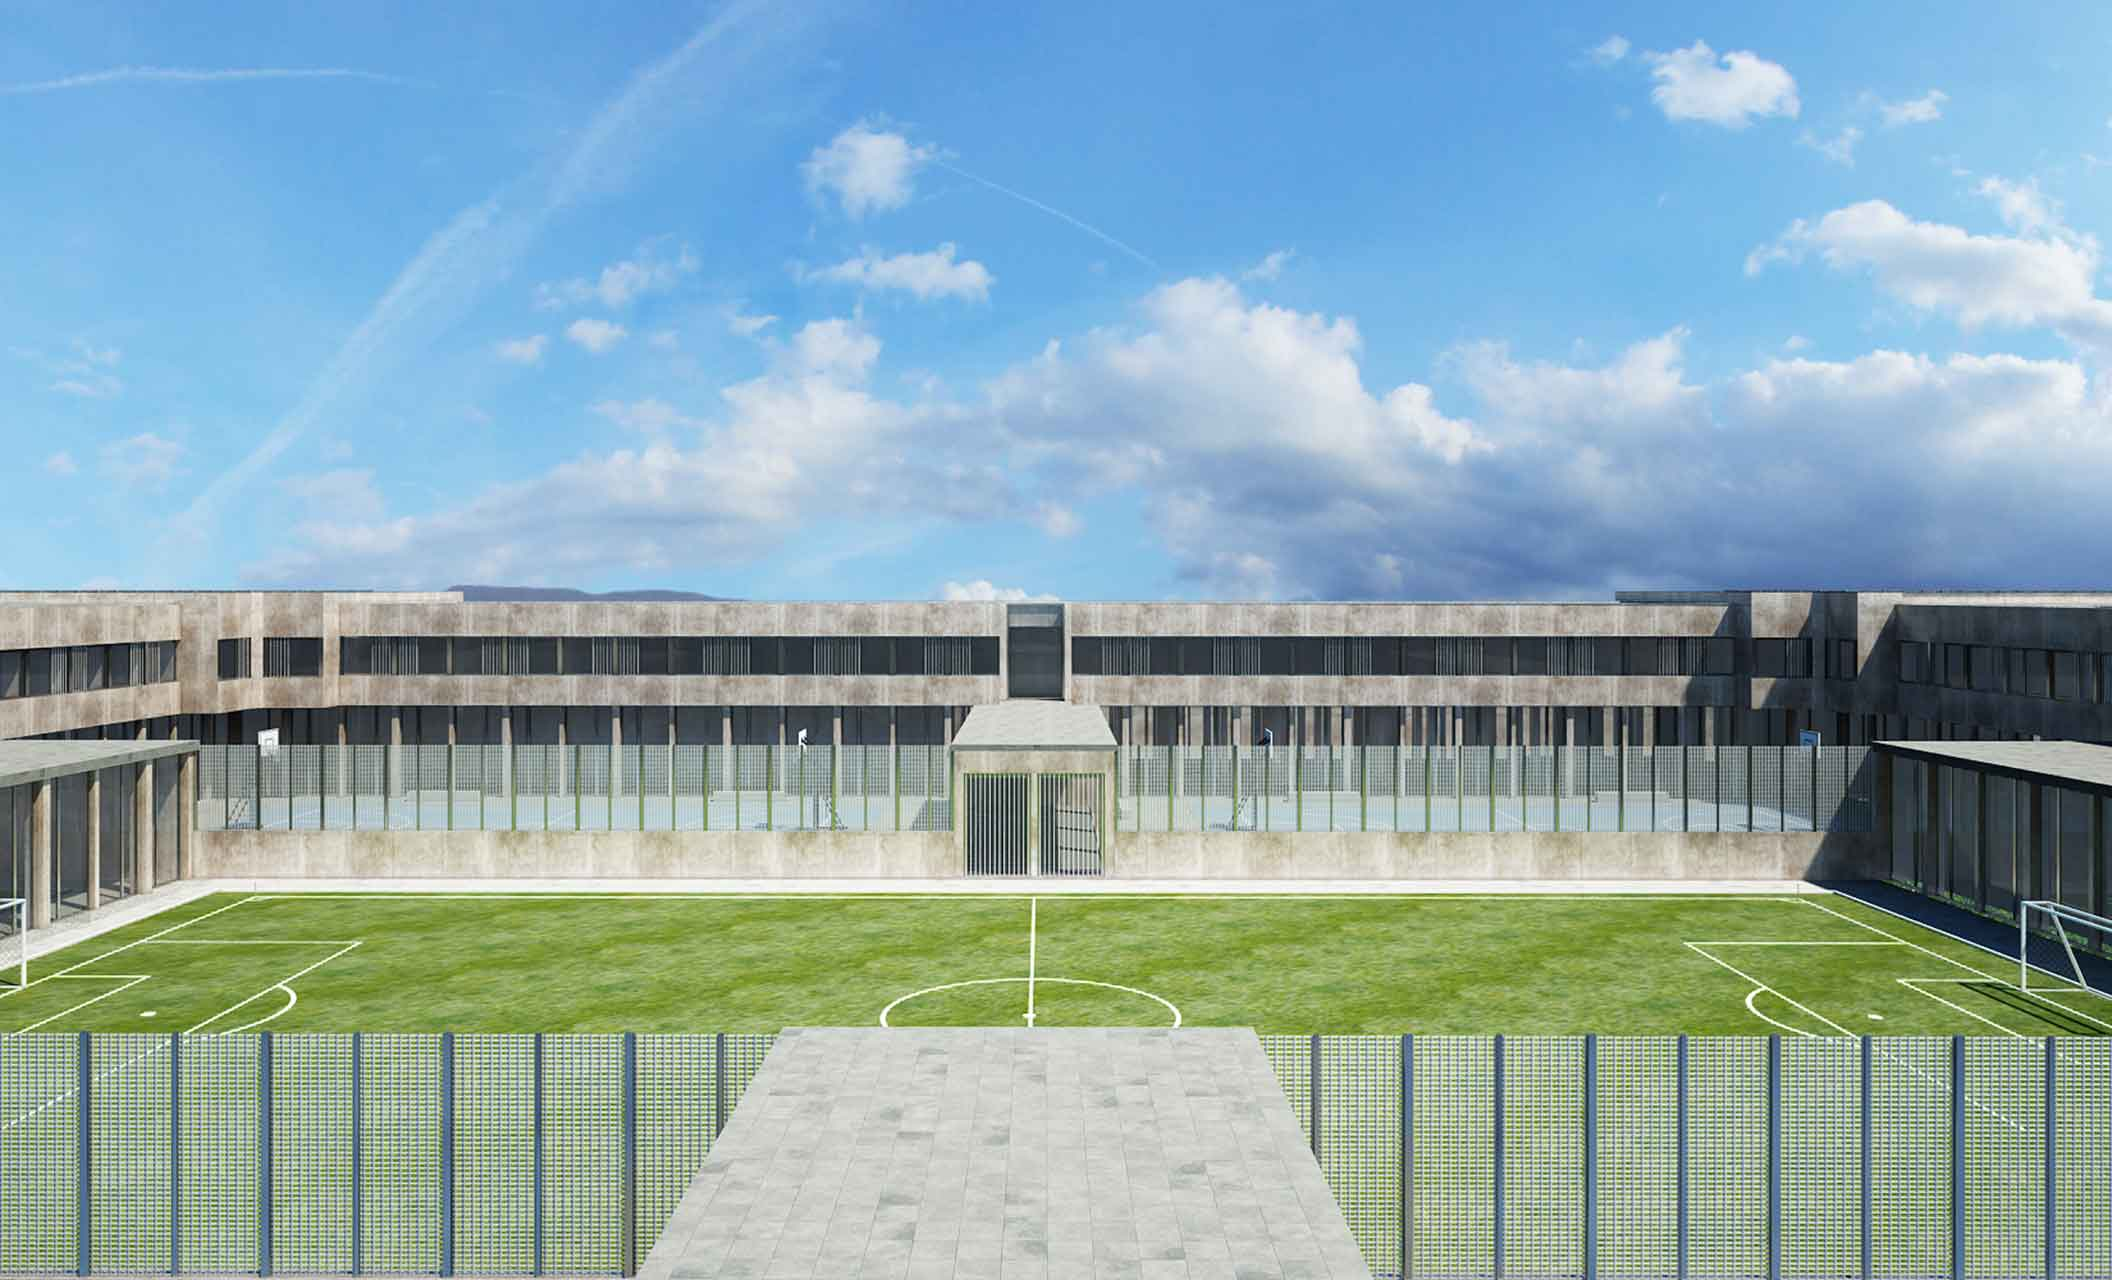 carcere verziano campo da calcio